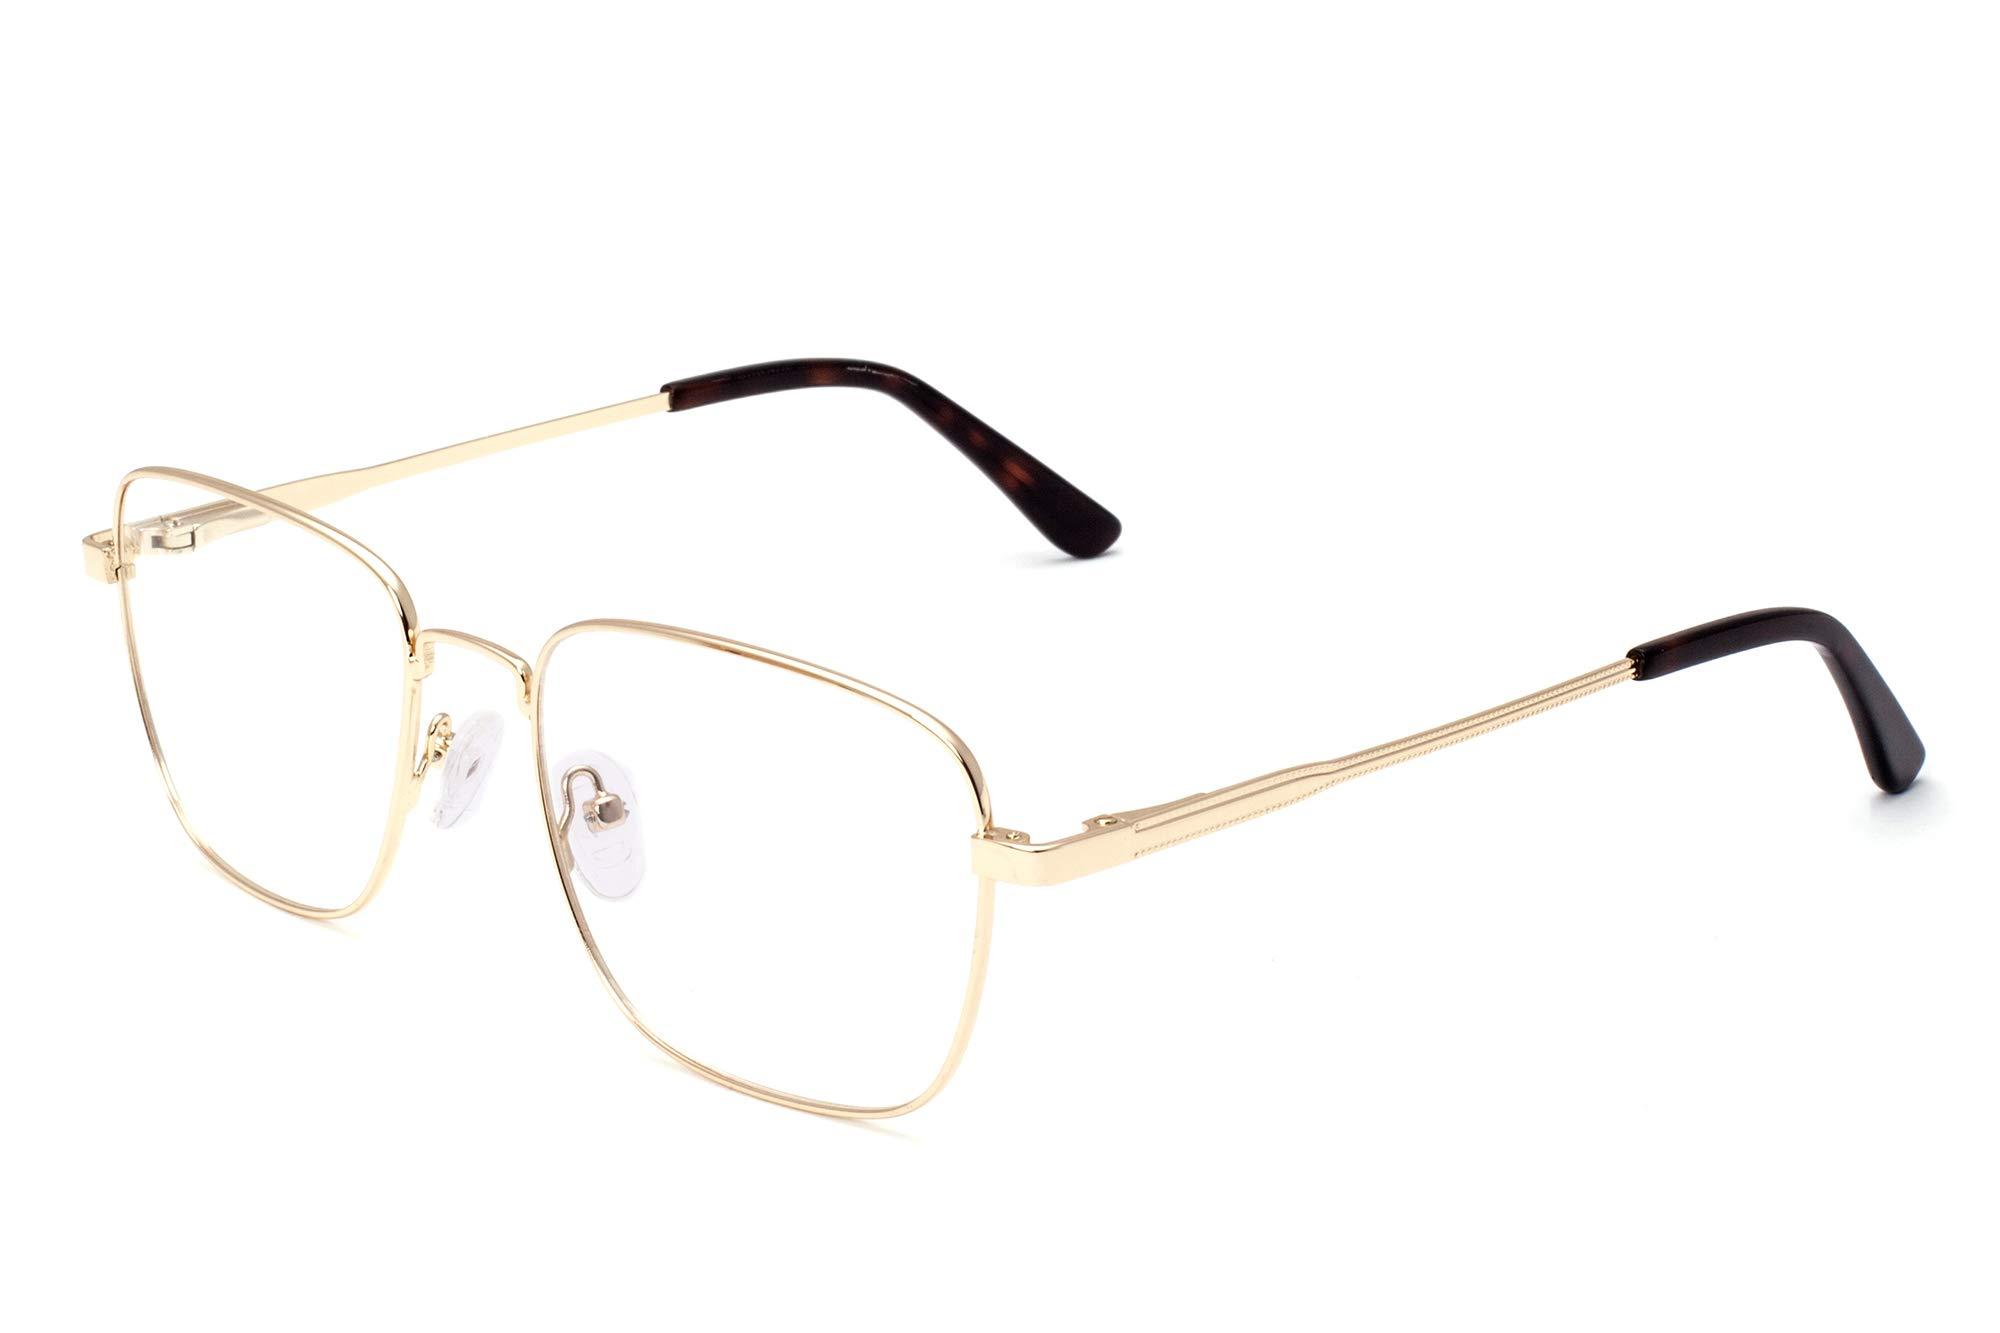 SHINU Men's Metal Frame Anti Blue Light Progressive Multifocal Computer Glasses-MAT5816(C2,no magnification)